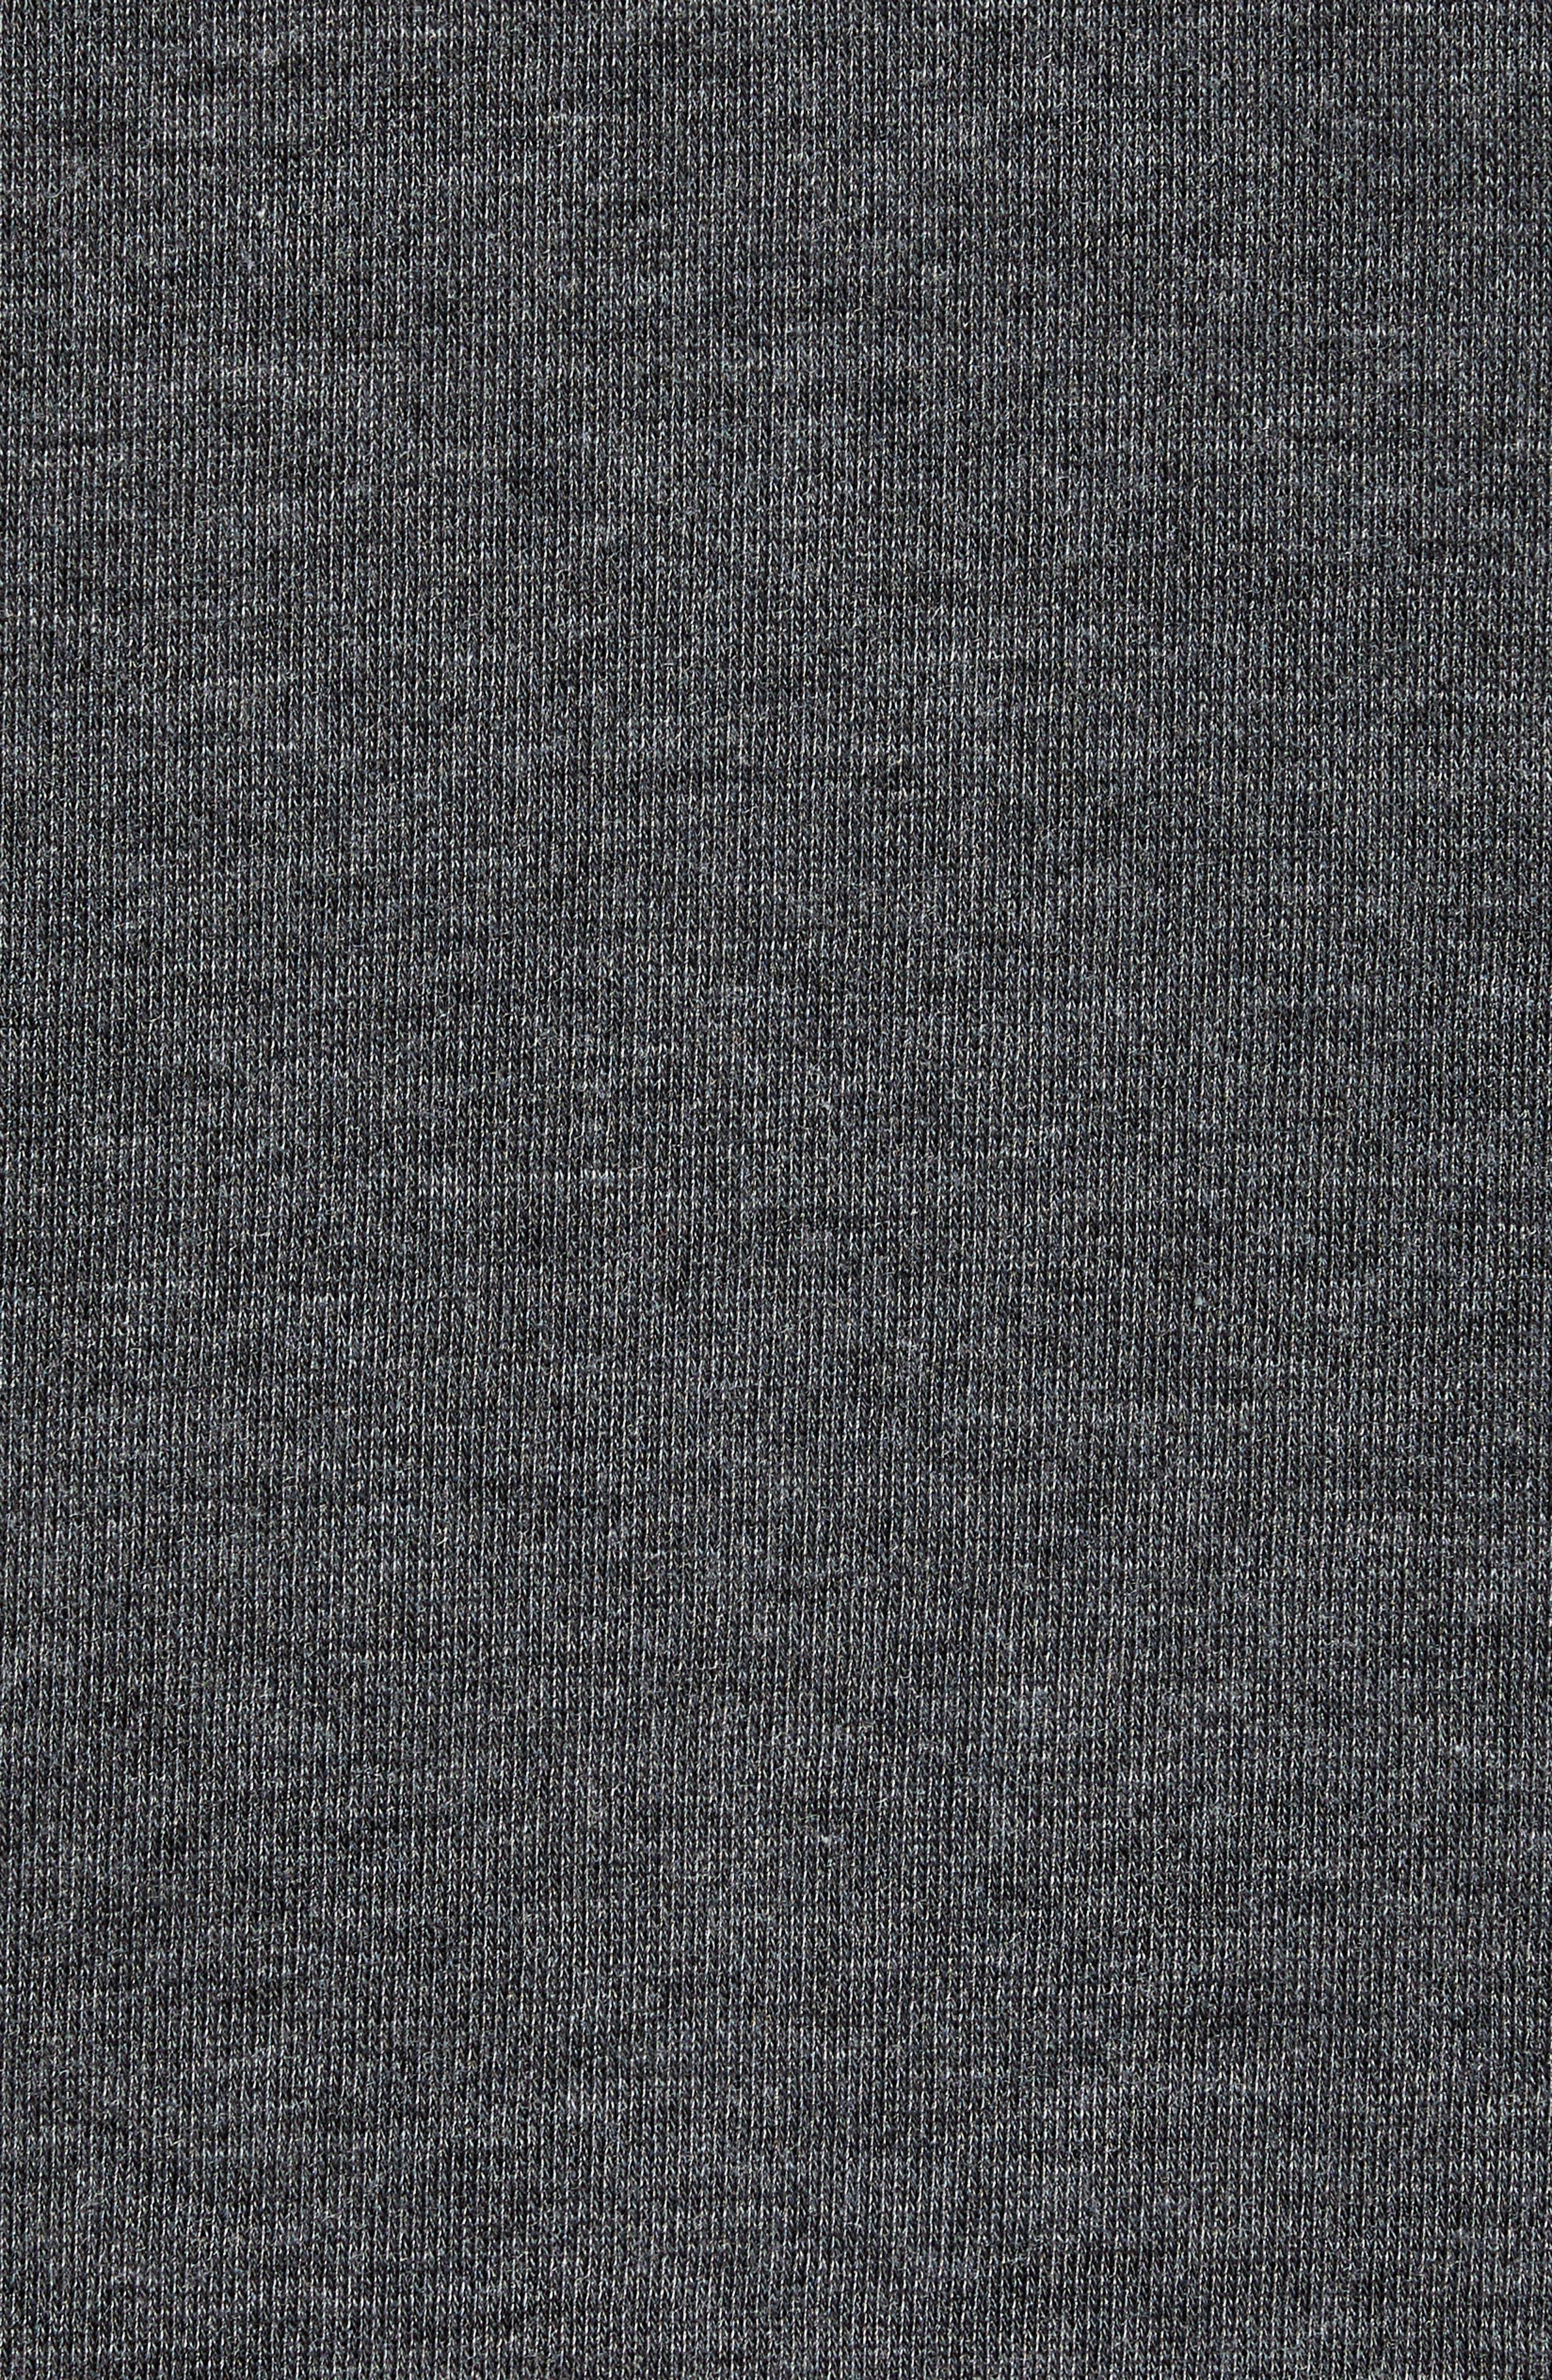 Crewneck Regular Fit Pullover,                             Alternate thumbnail 5, color,                             021